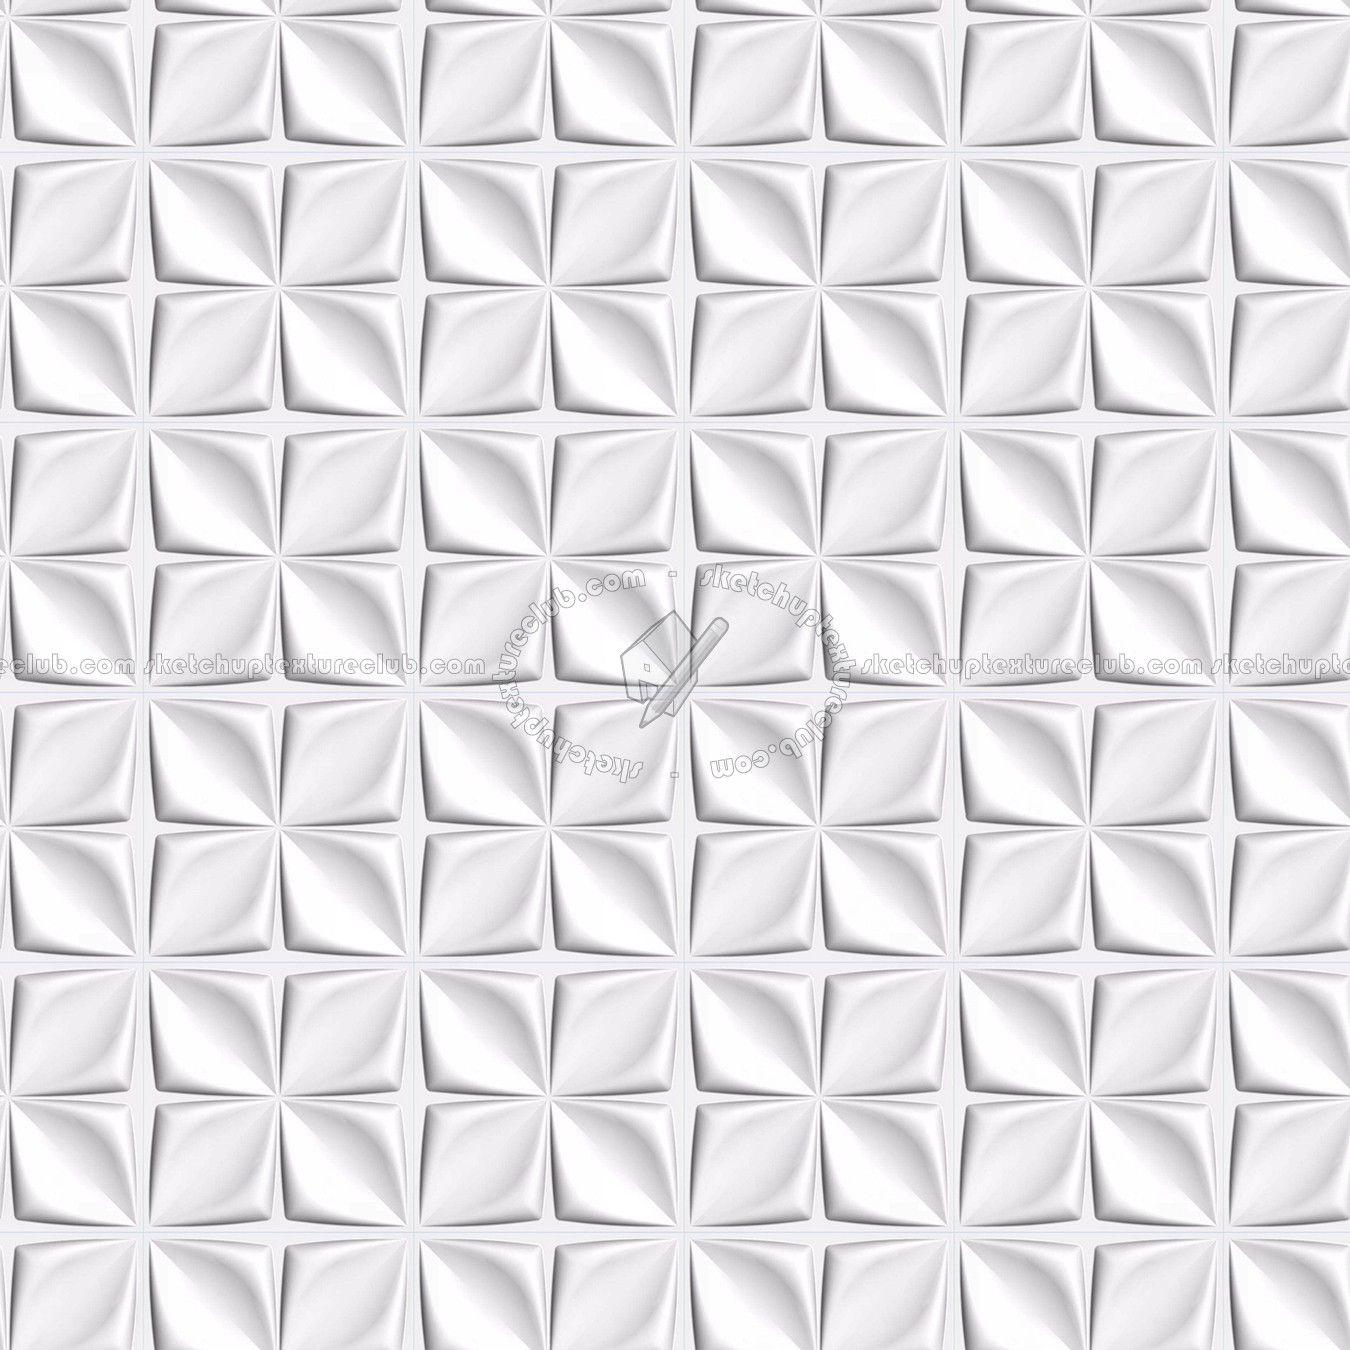 Texture seamless | White interior 3D wall panel texture seamless ... for Office Ceiling Texture Seamless  lp5fsj